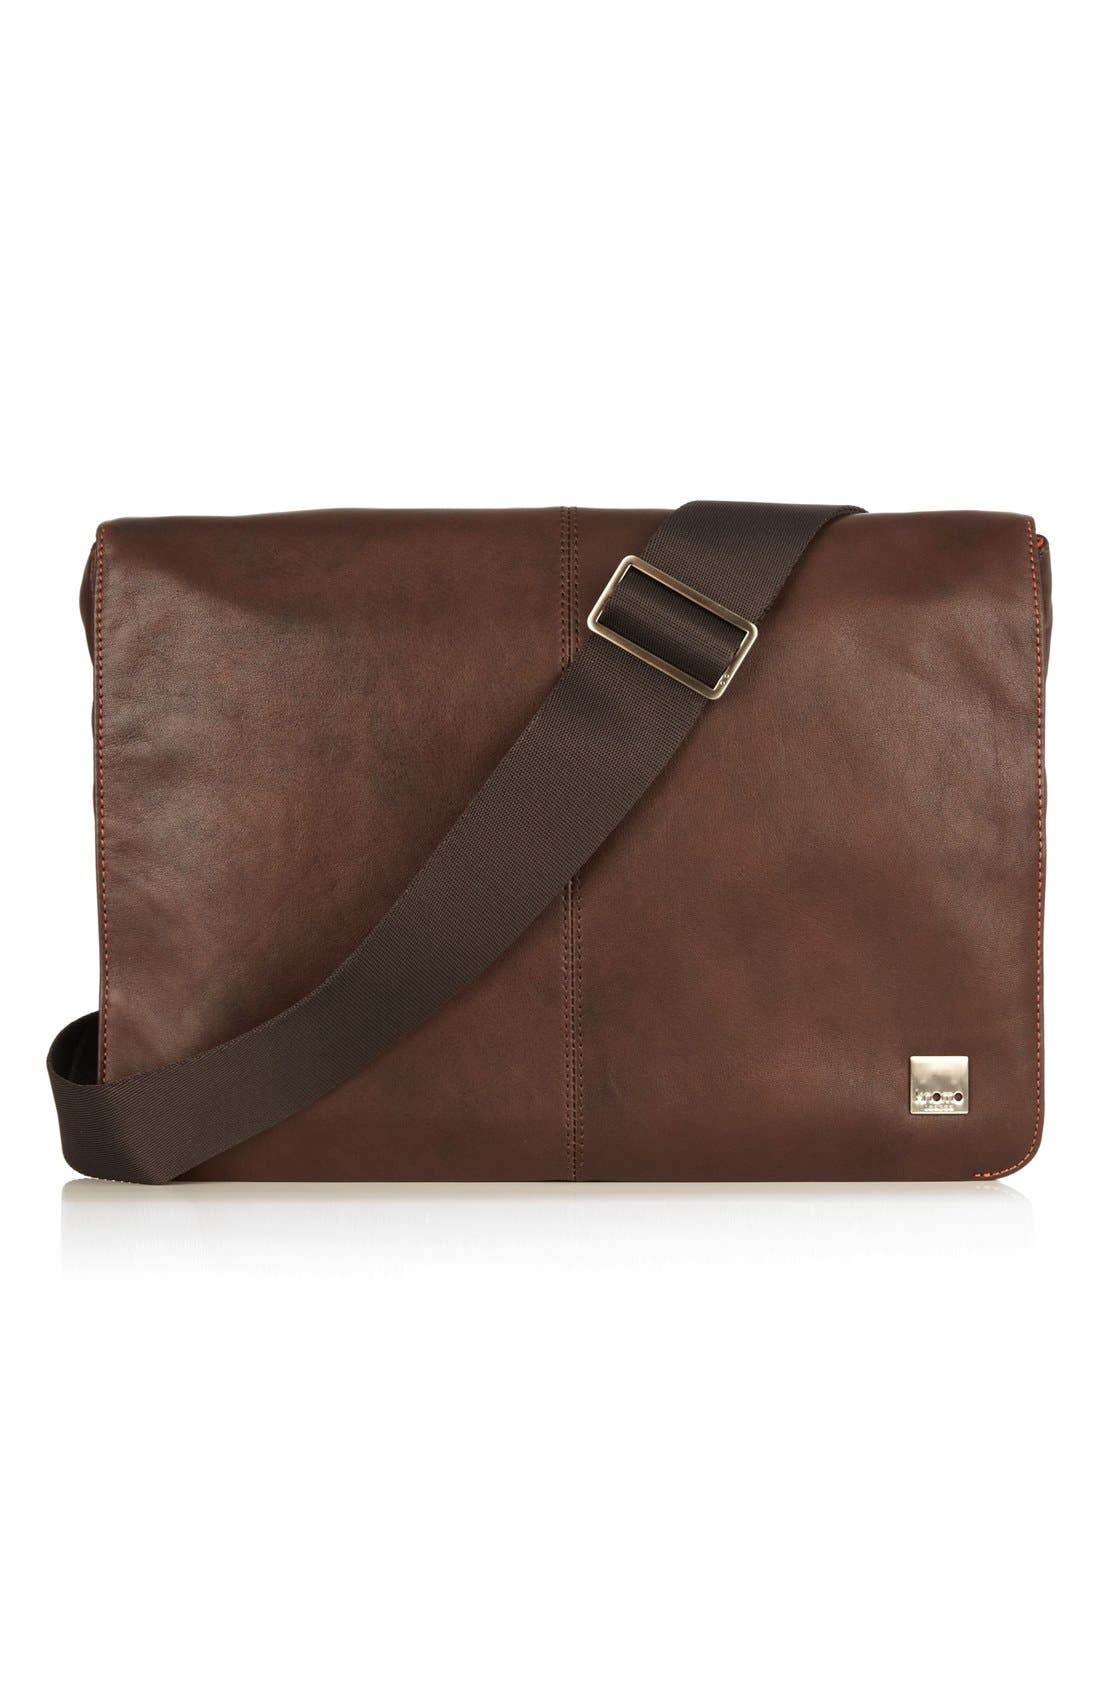 Main Image - KNOMO London 'Kinsale' Messenger Bag